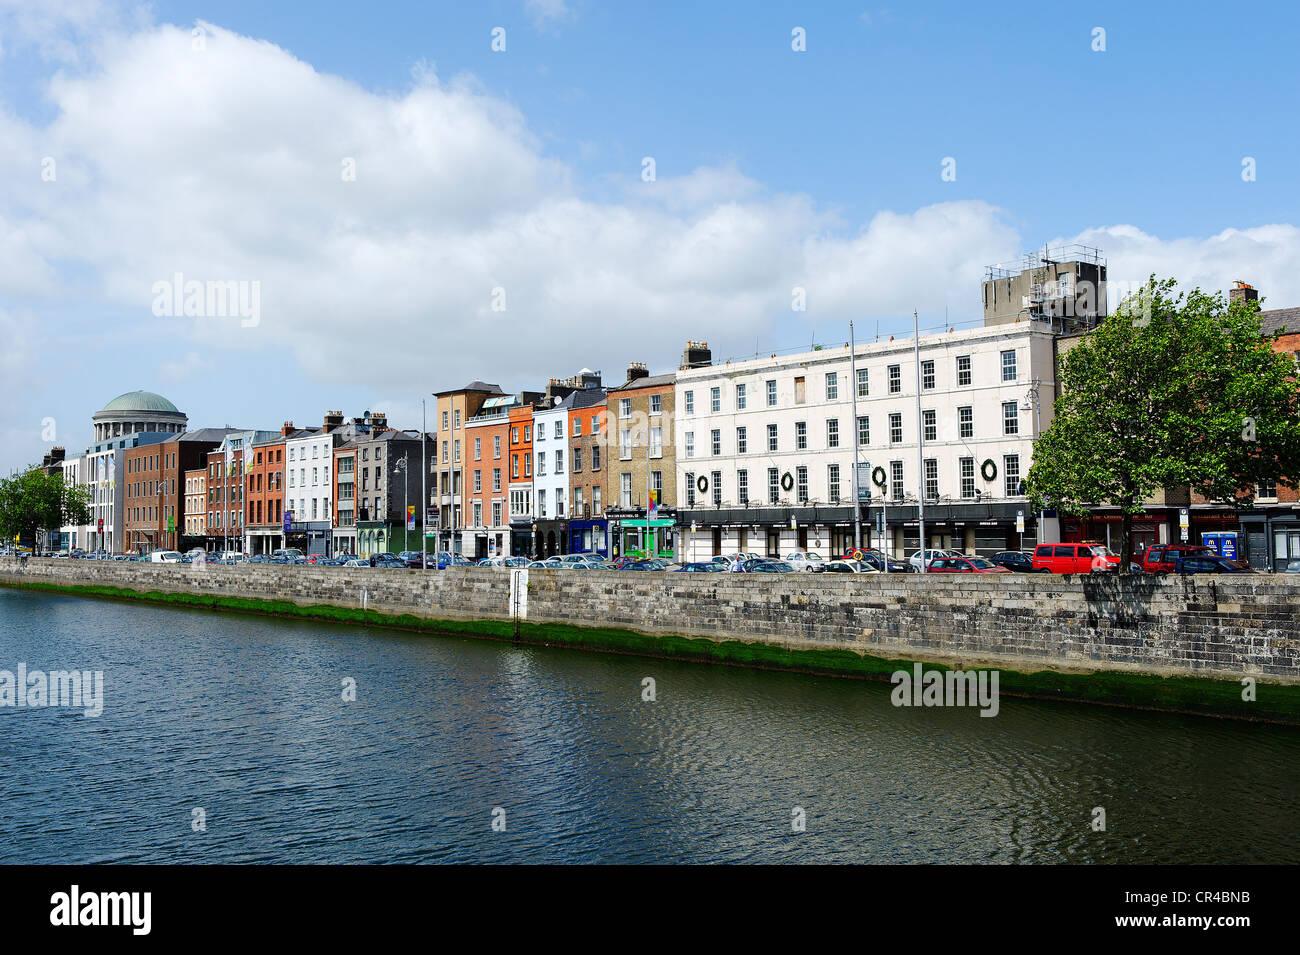 Houses on the Liffey river, Dublin, Republic of Ireland, Europe - Stock Image